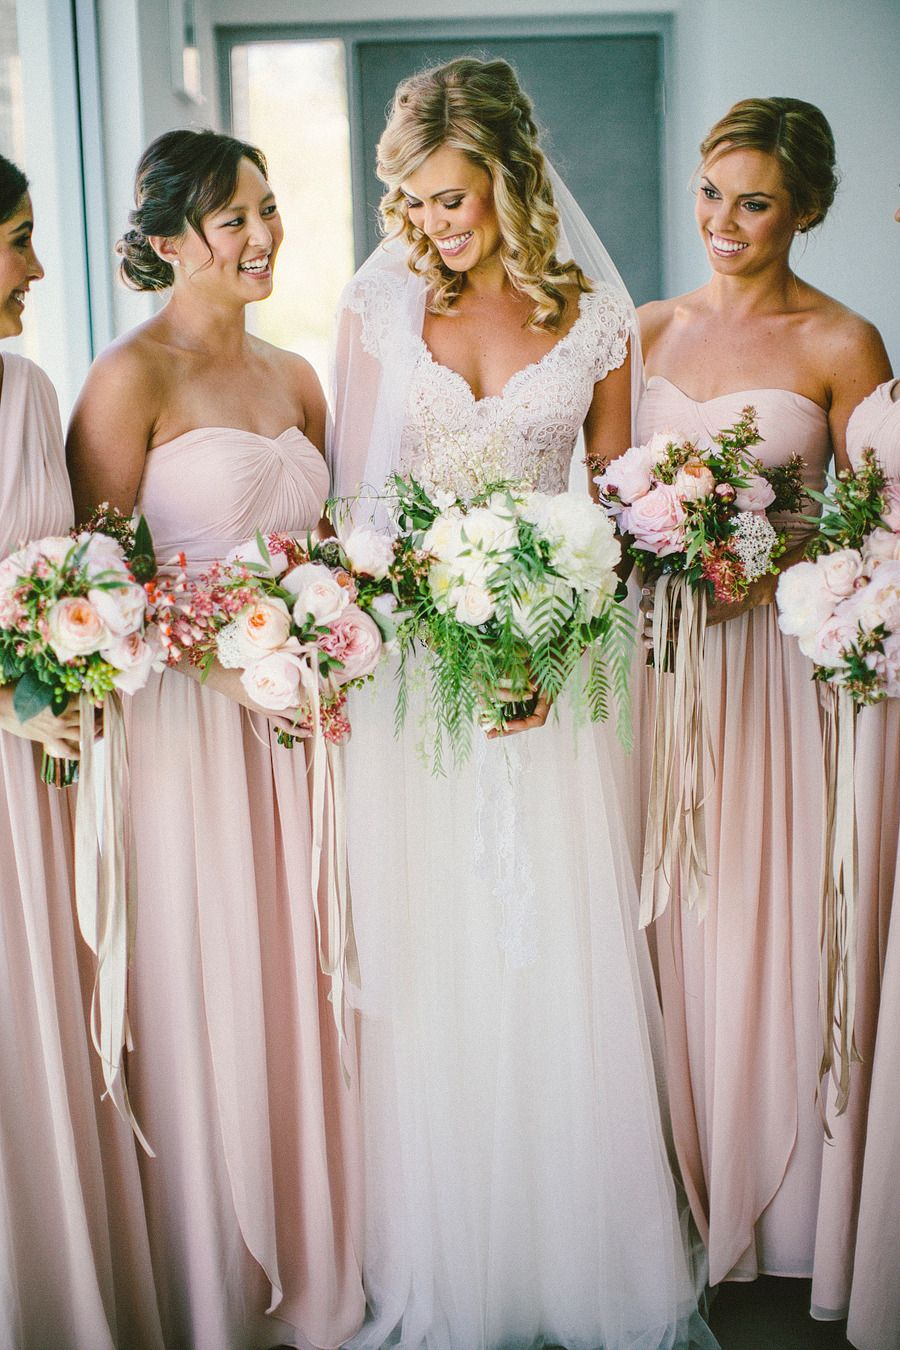 Blush aidan dresses jenny yoo bridesmaid style inspiration blush aidan dresses jenny yoo ombrellifo Choice Image